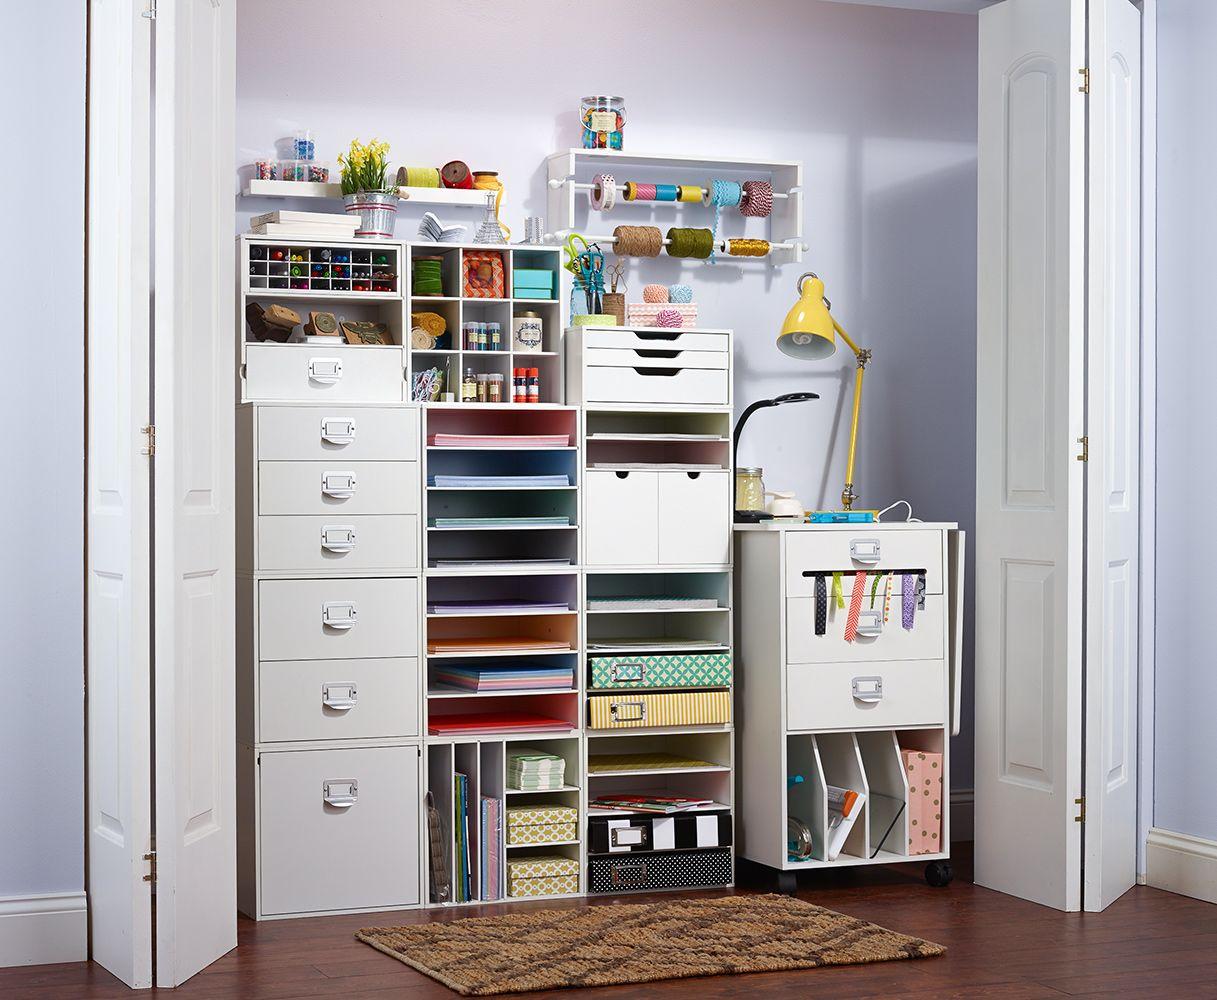 Closet creativity zones decorating ideas craft rooms pinterest